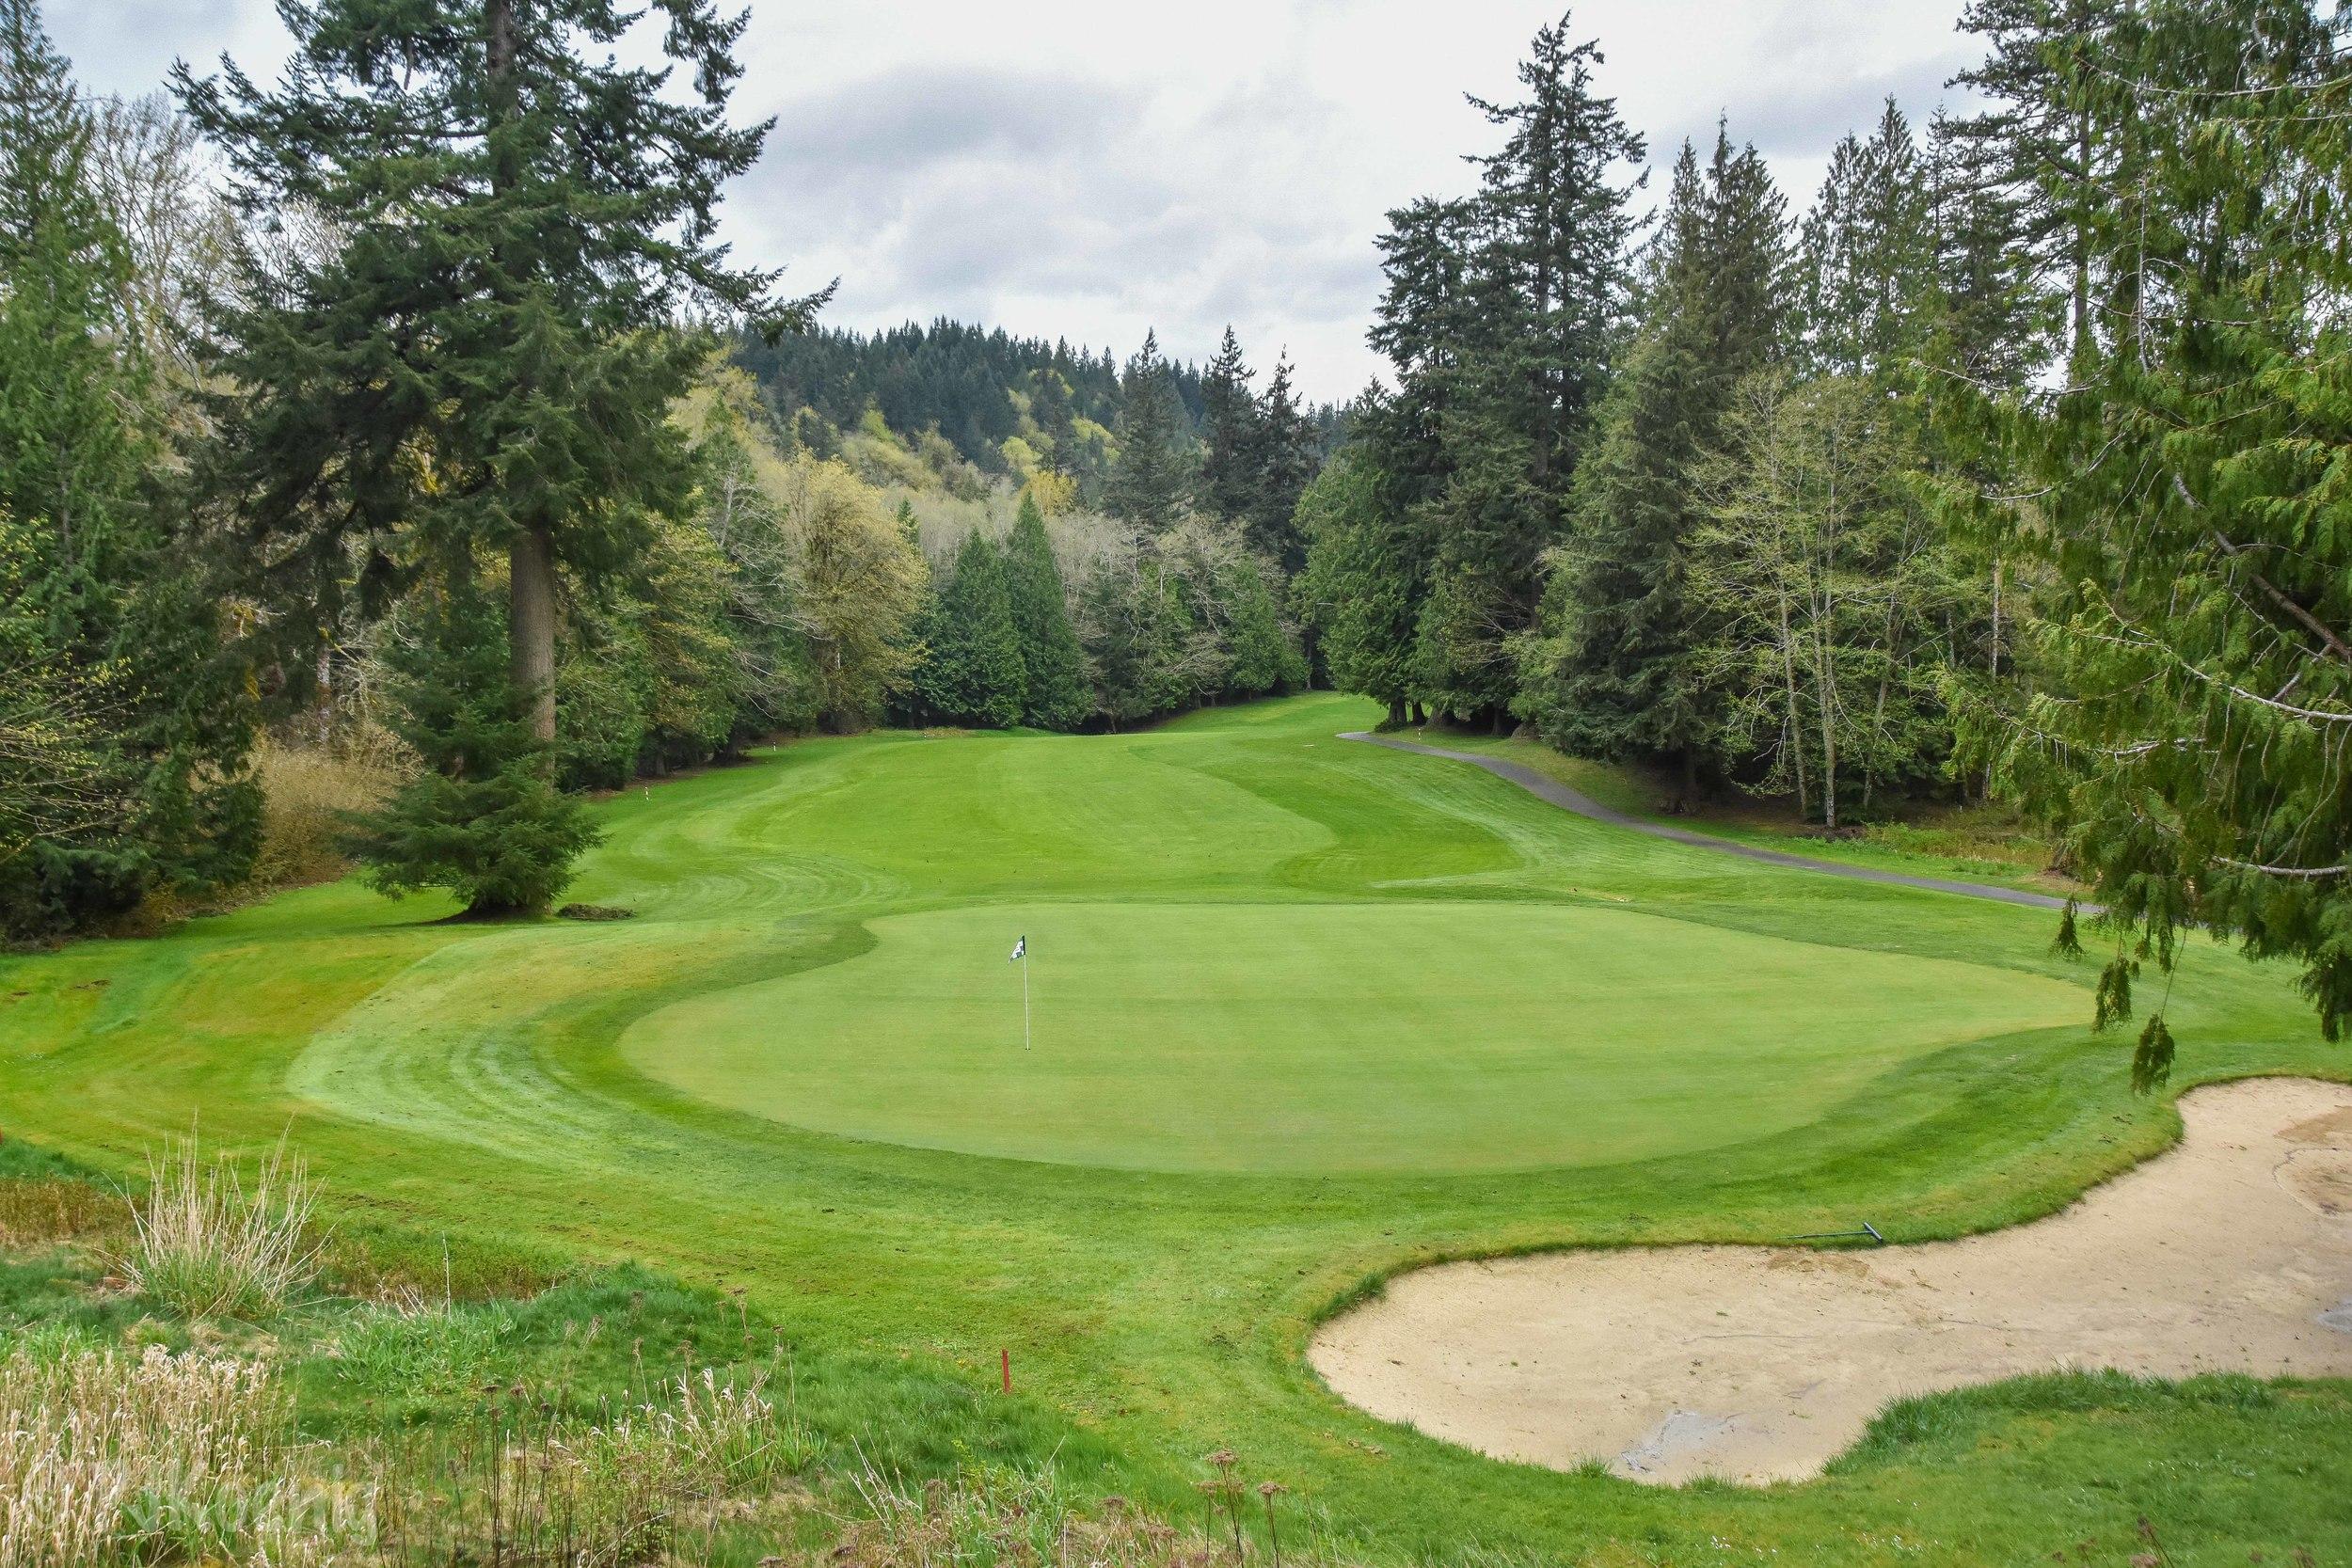 Lake Padden Golf Course - Bellingham, WA